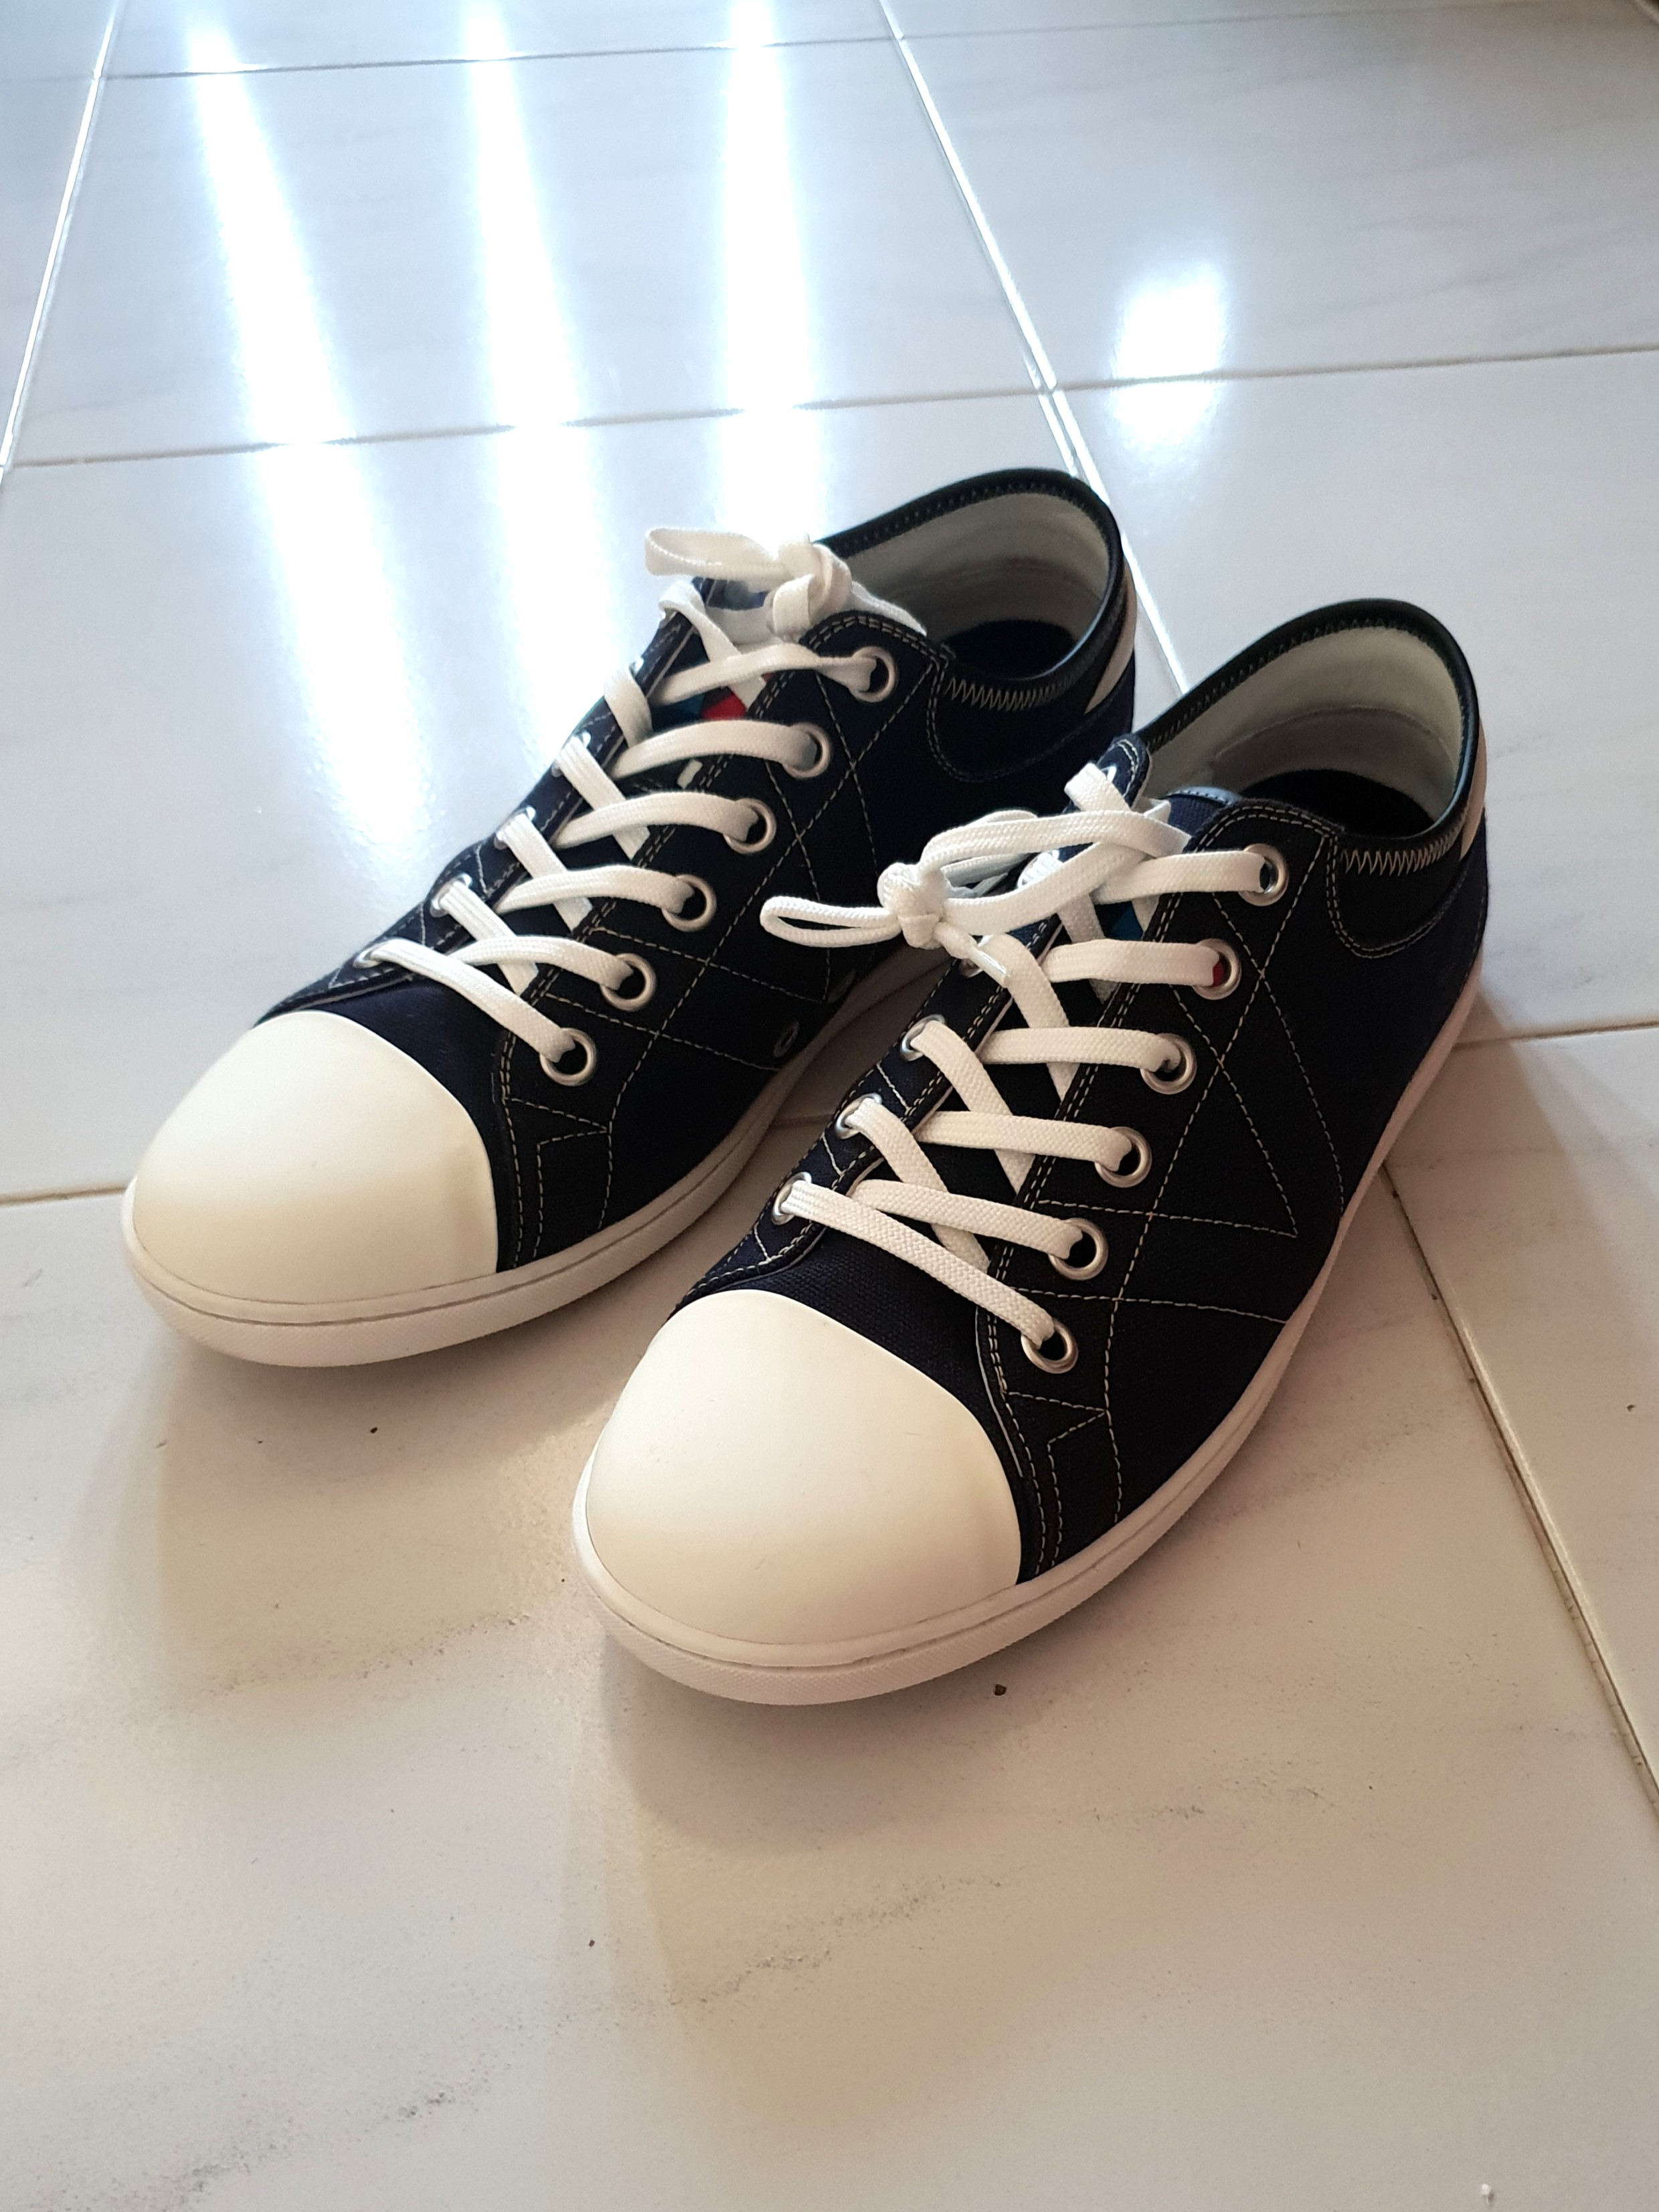 22dbecad84dd ... authentic lv louis vuitton shoes sneakers men s fashion footwear ...